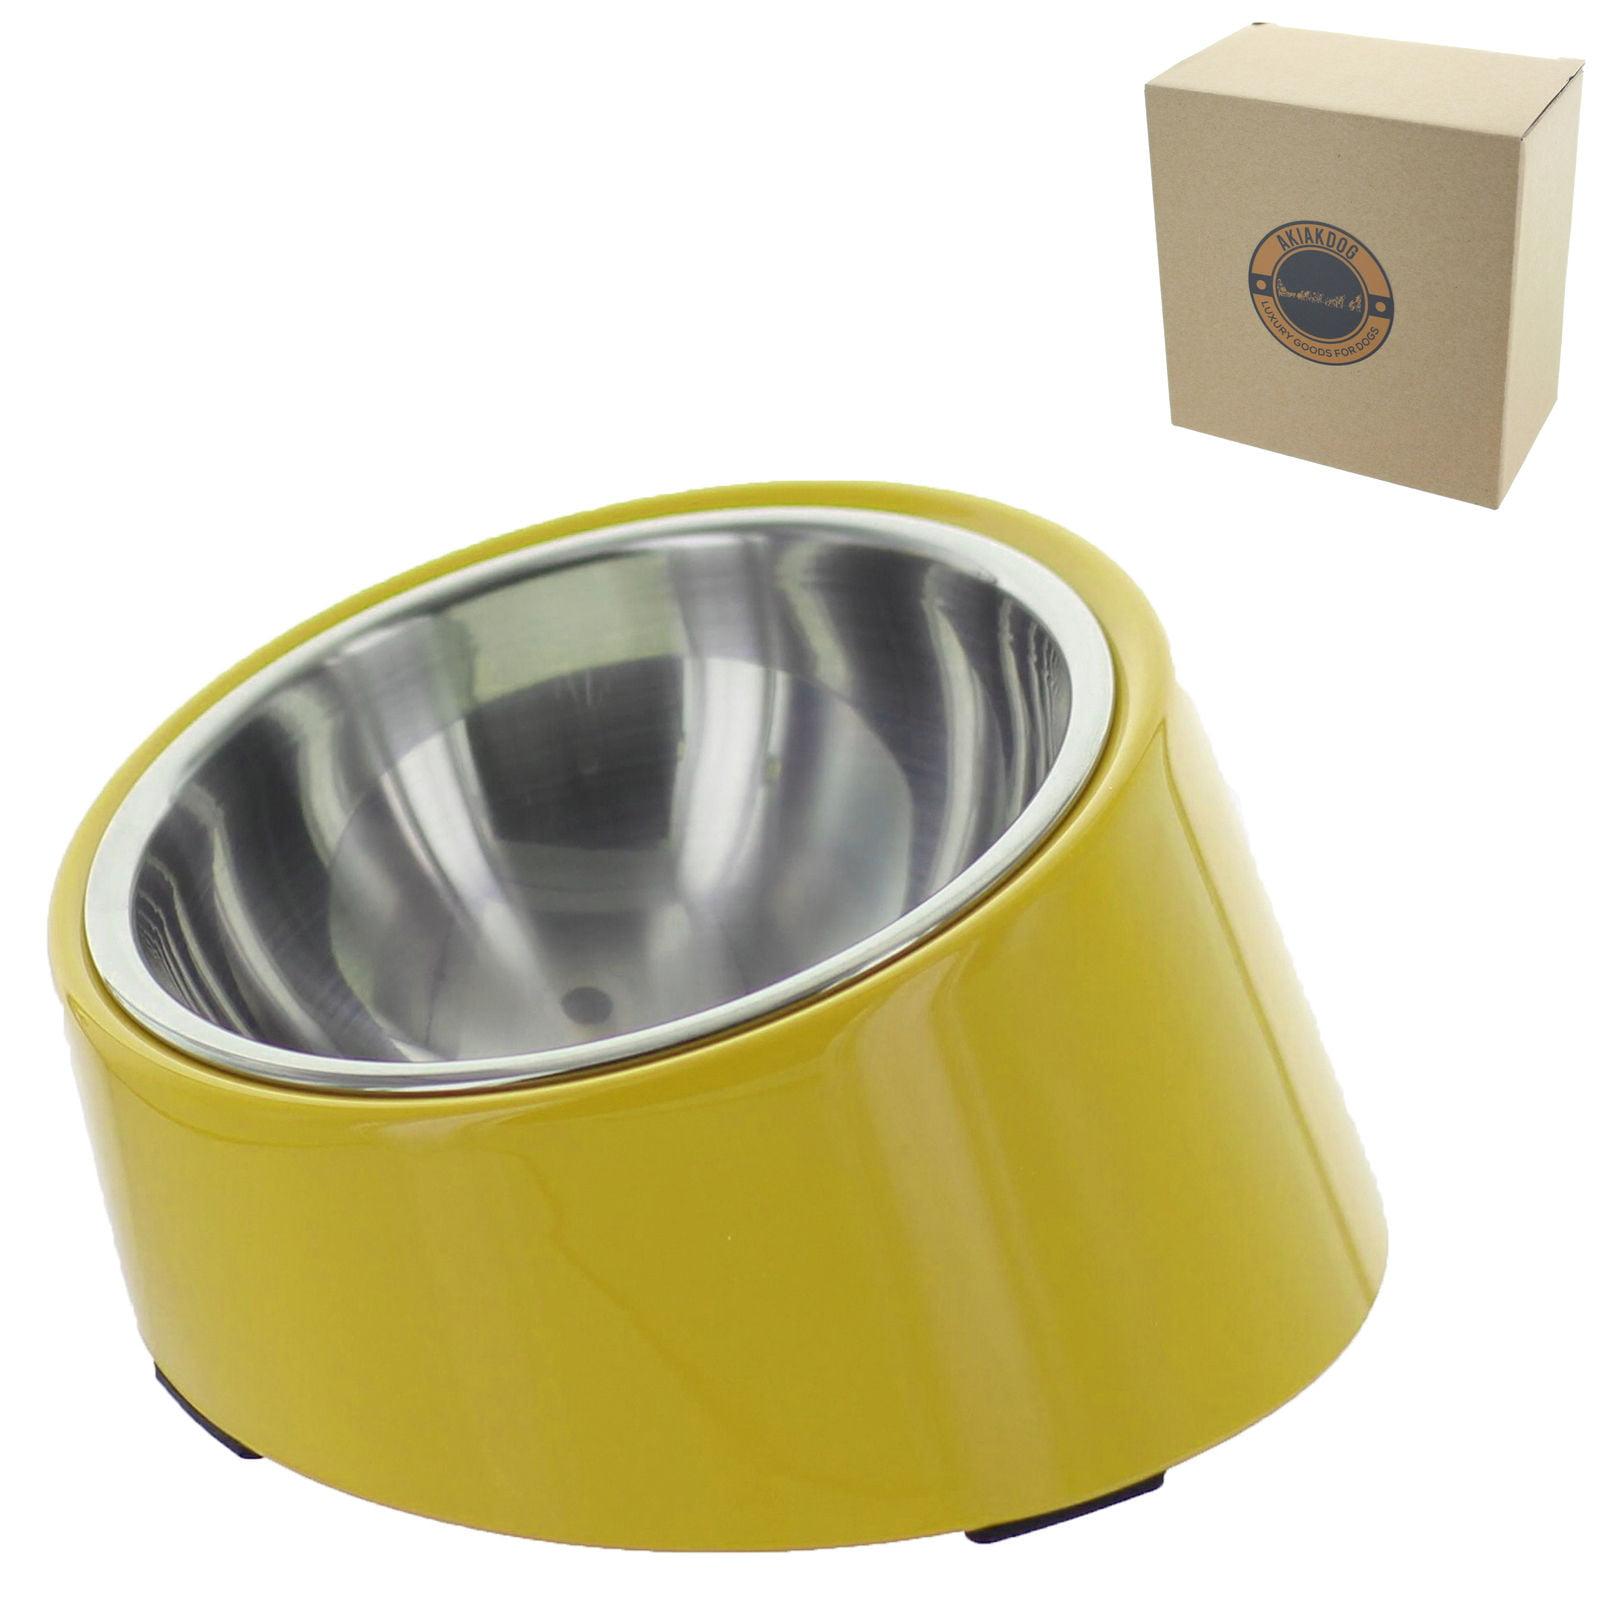 Slope Design Medium Akiakdog Slope Pet Bowl Prefect Bowl for Feeding Dogs and Cats